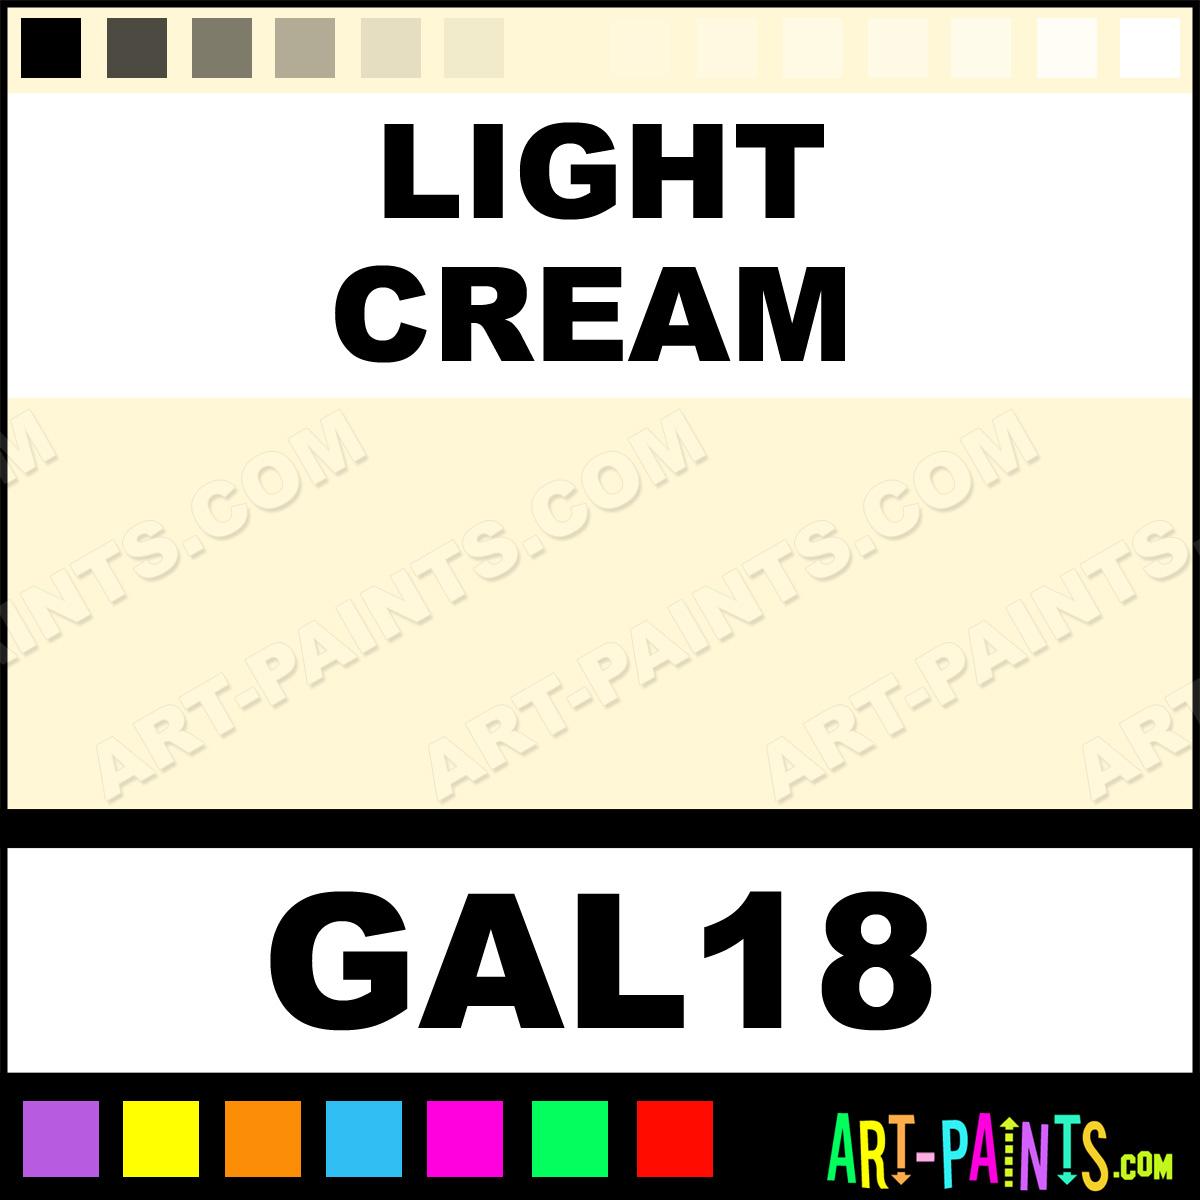 Light cream milk paint casein milk paints gal18 light for Best light cream paint color